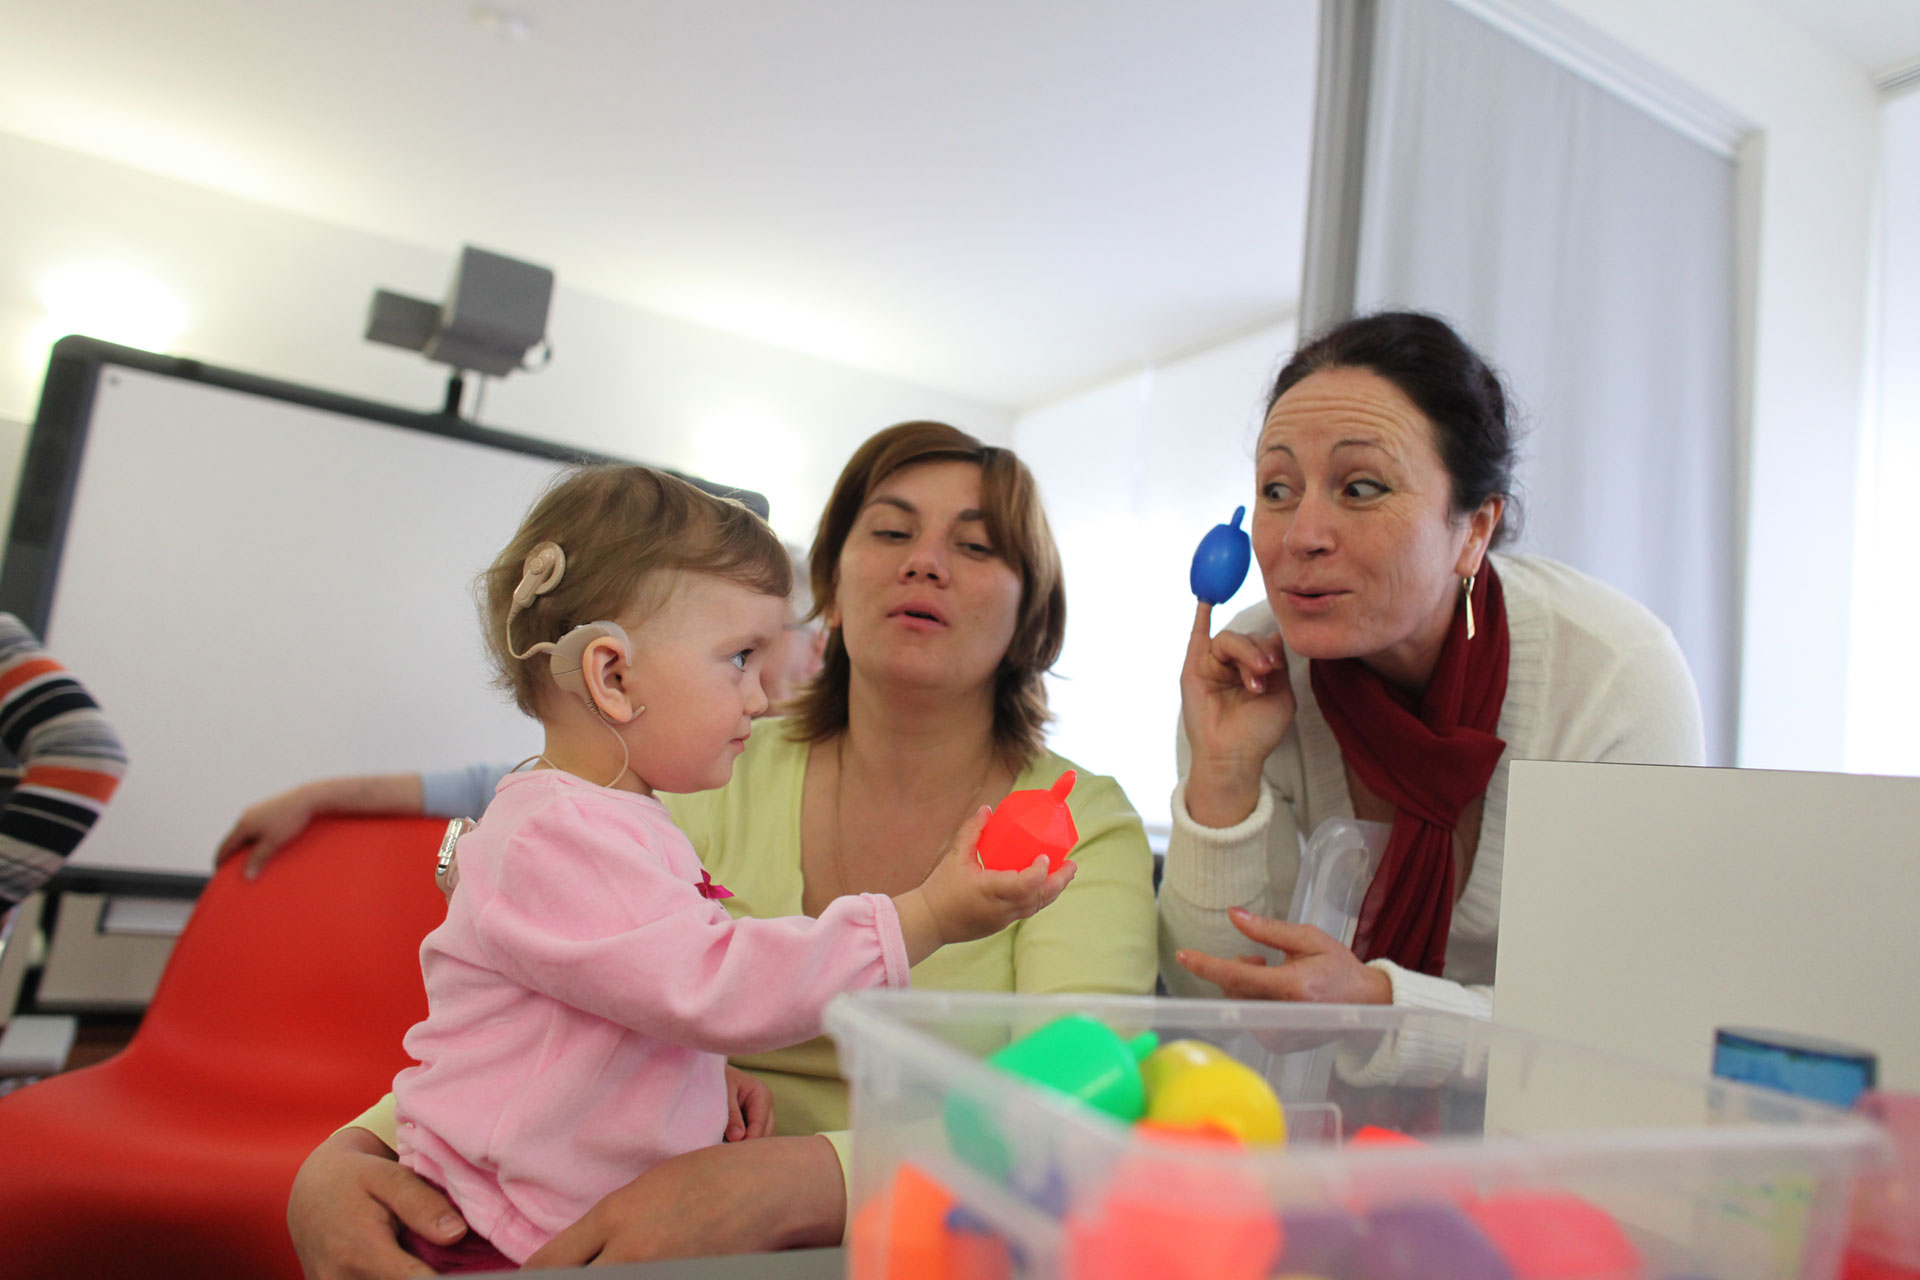 Cochlea-Implantat bei Kindern